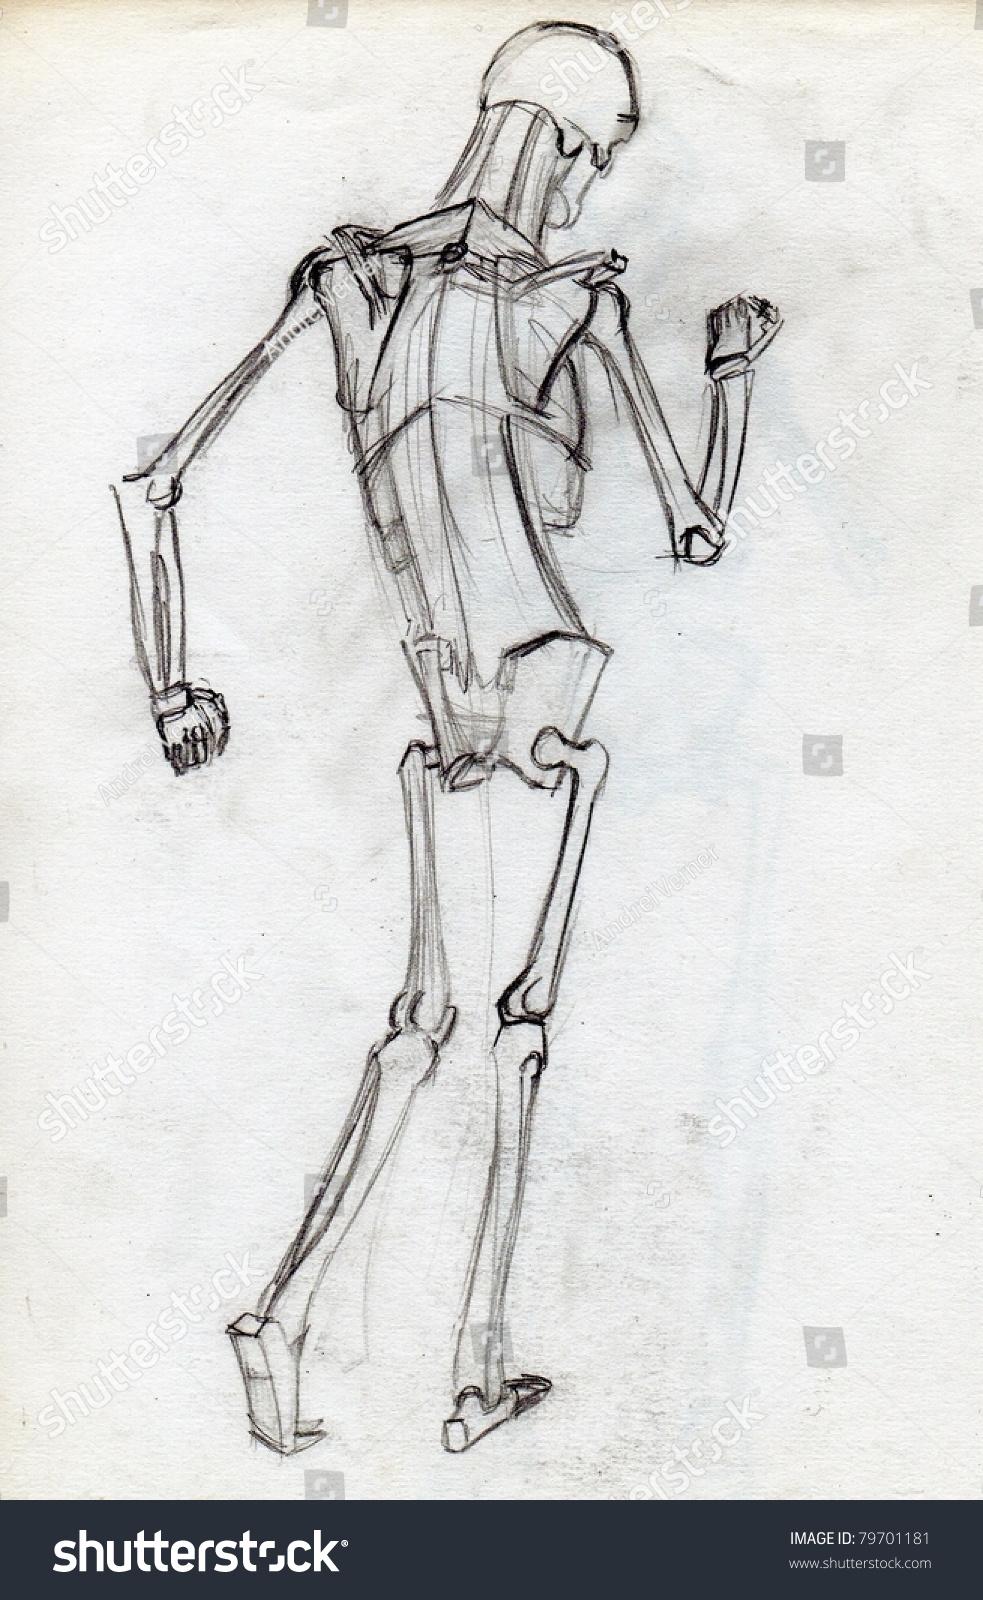 Human Skeleton Pencil Hand Drawing Stock Illustration 79701181